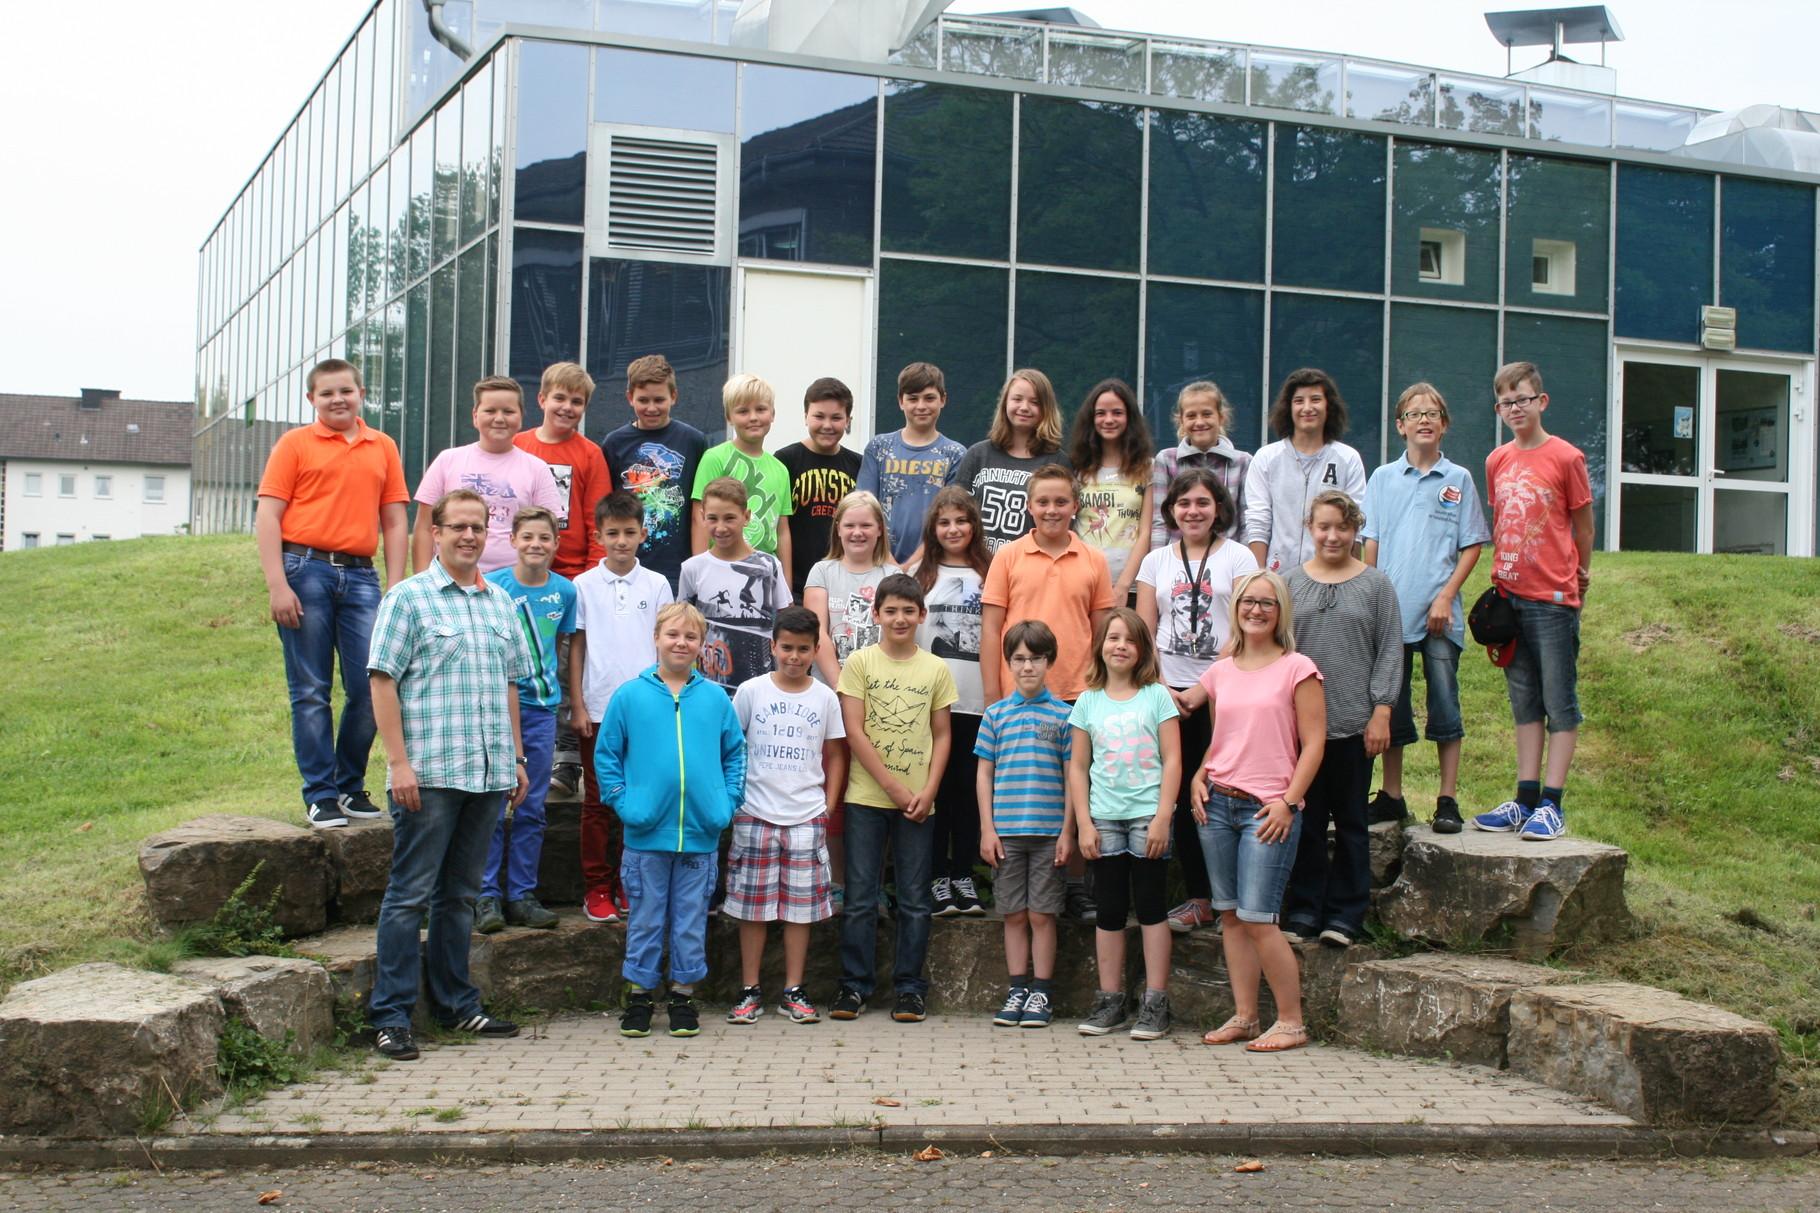 Klasse 6b. Klassenlehrer: Frau Busch und Herr Womelsdorf